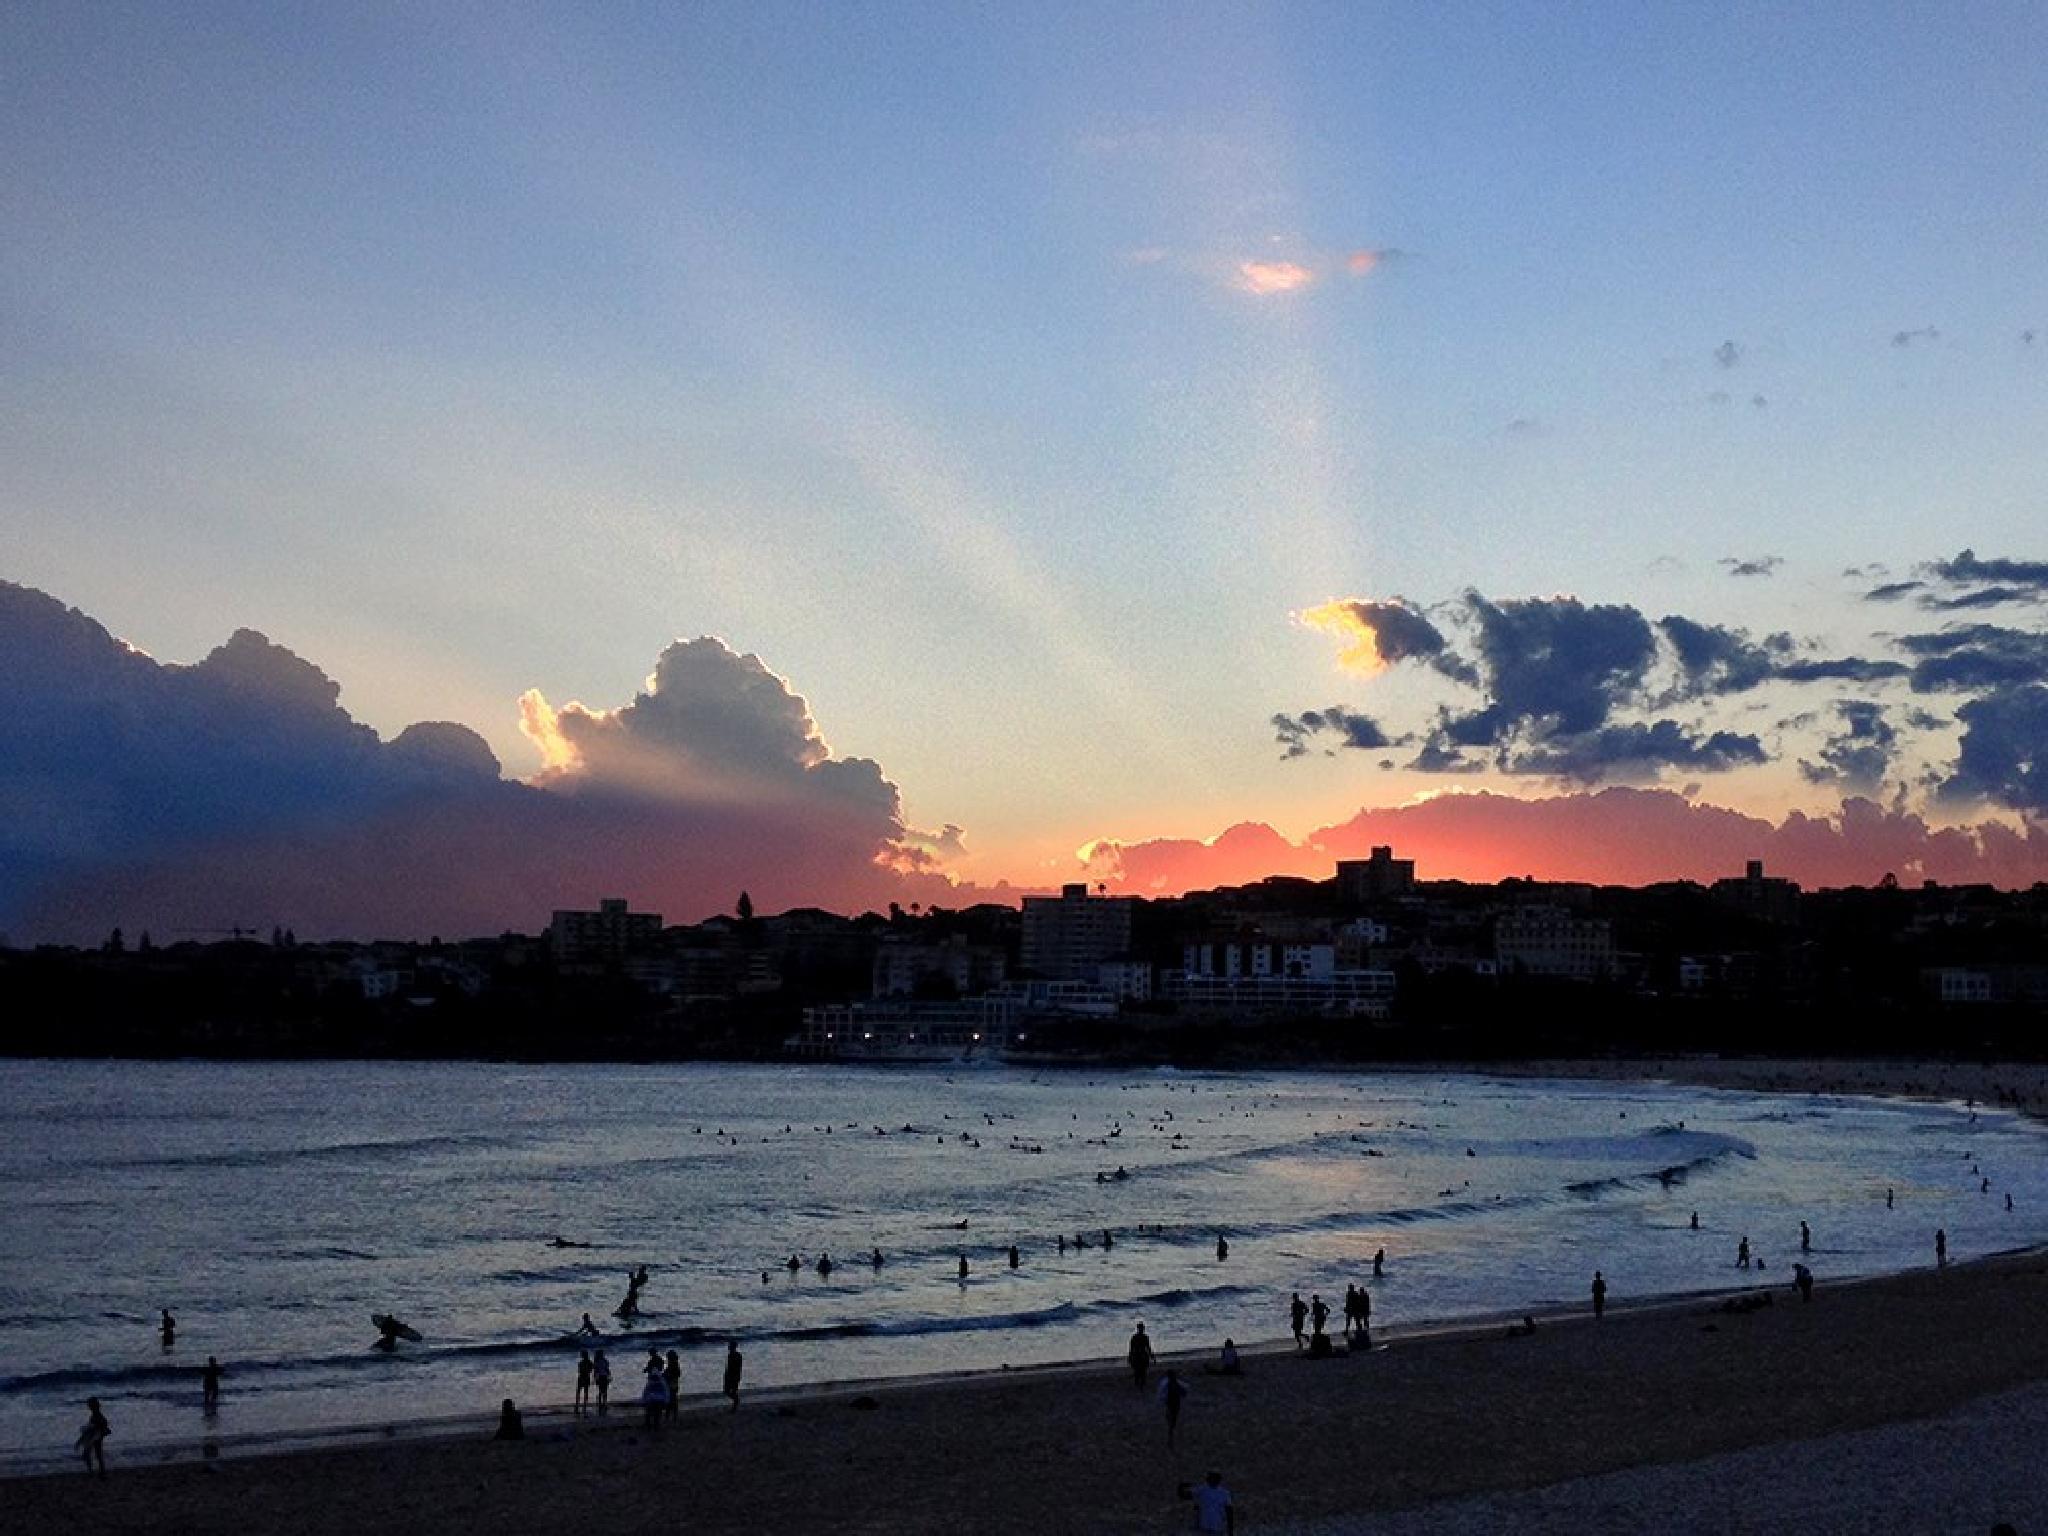 Bondi Sunset by Richie Henson